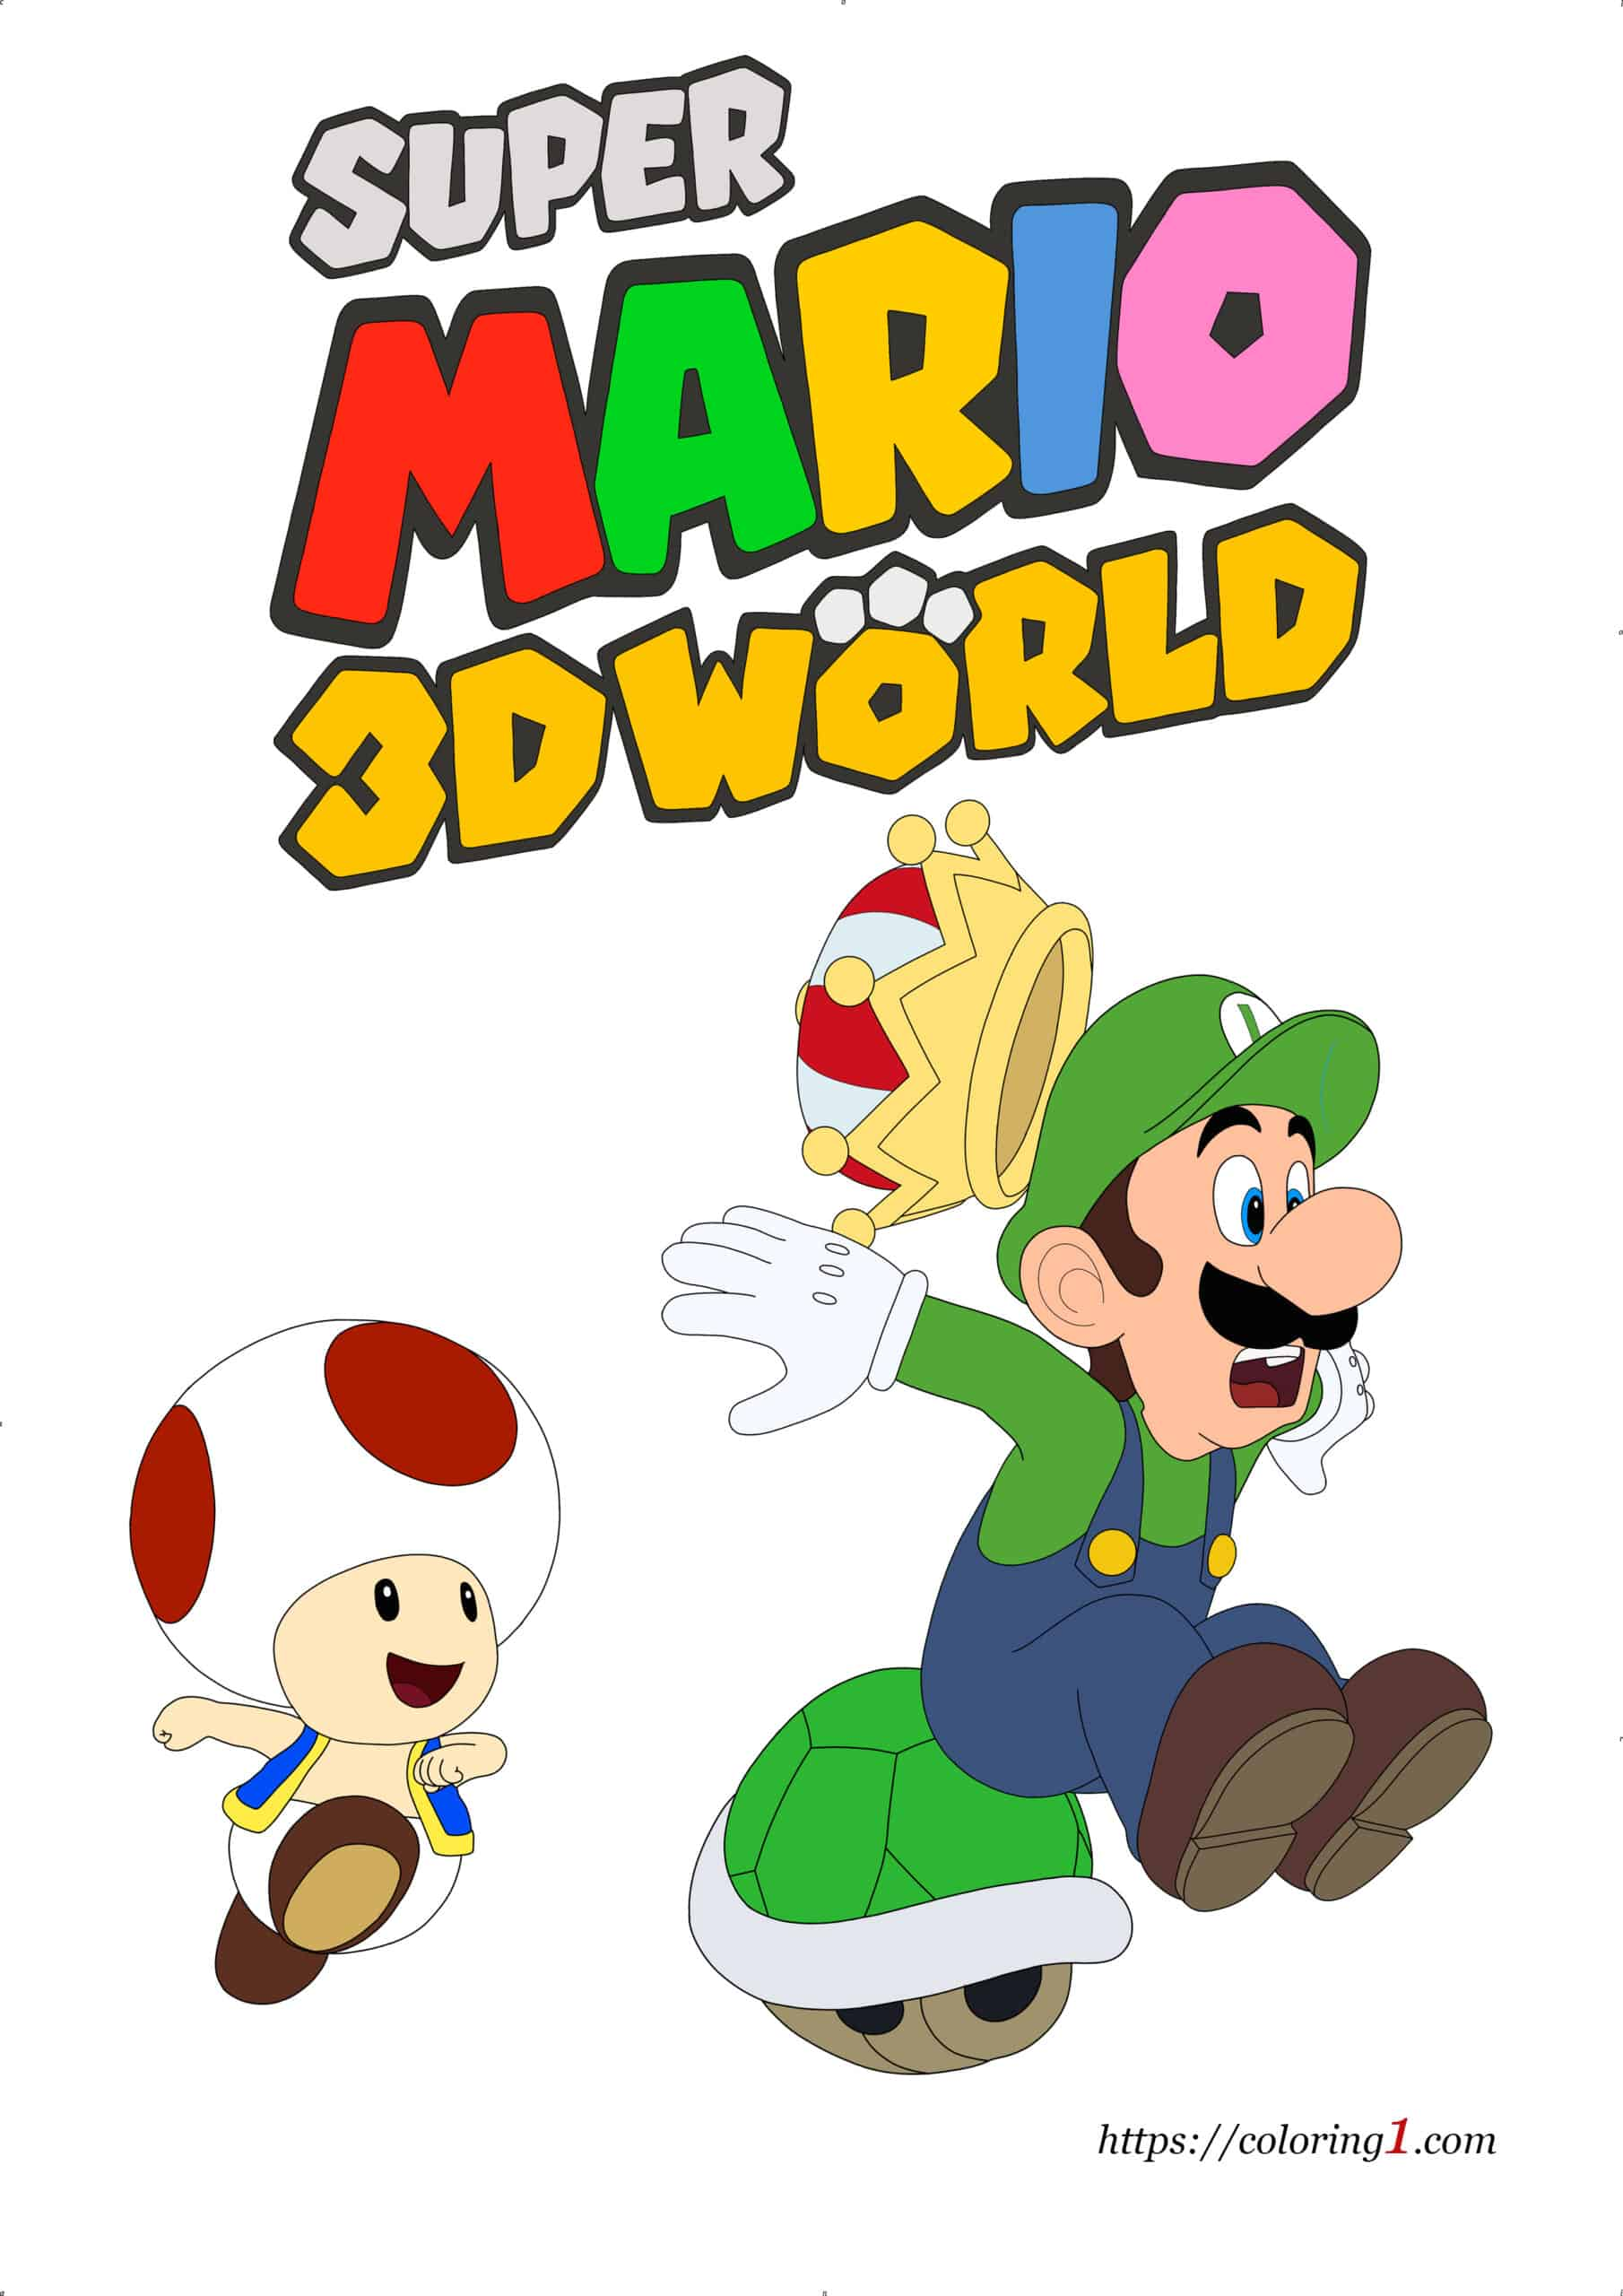 Super Mario 3D World image hew to color jpg